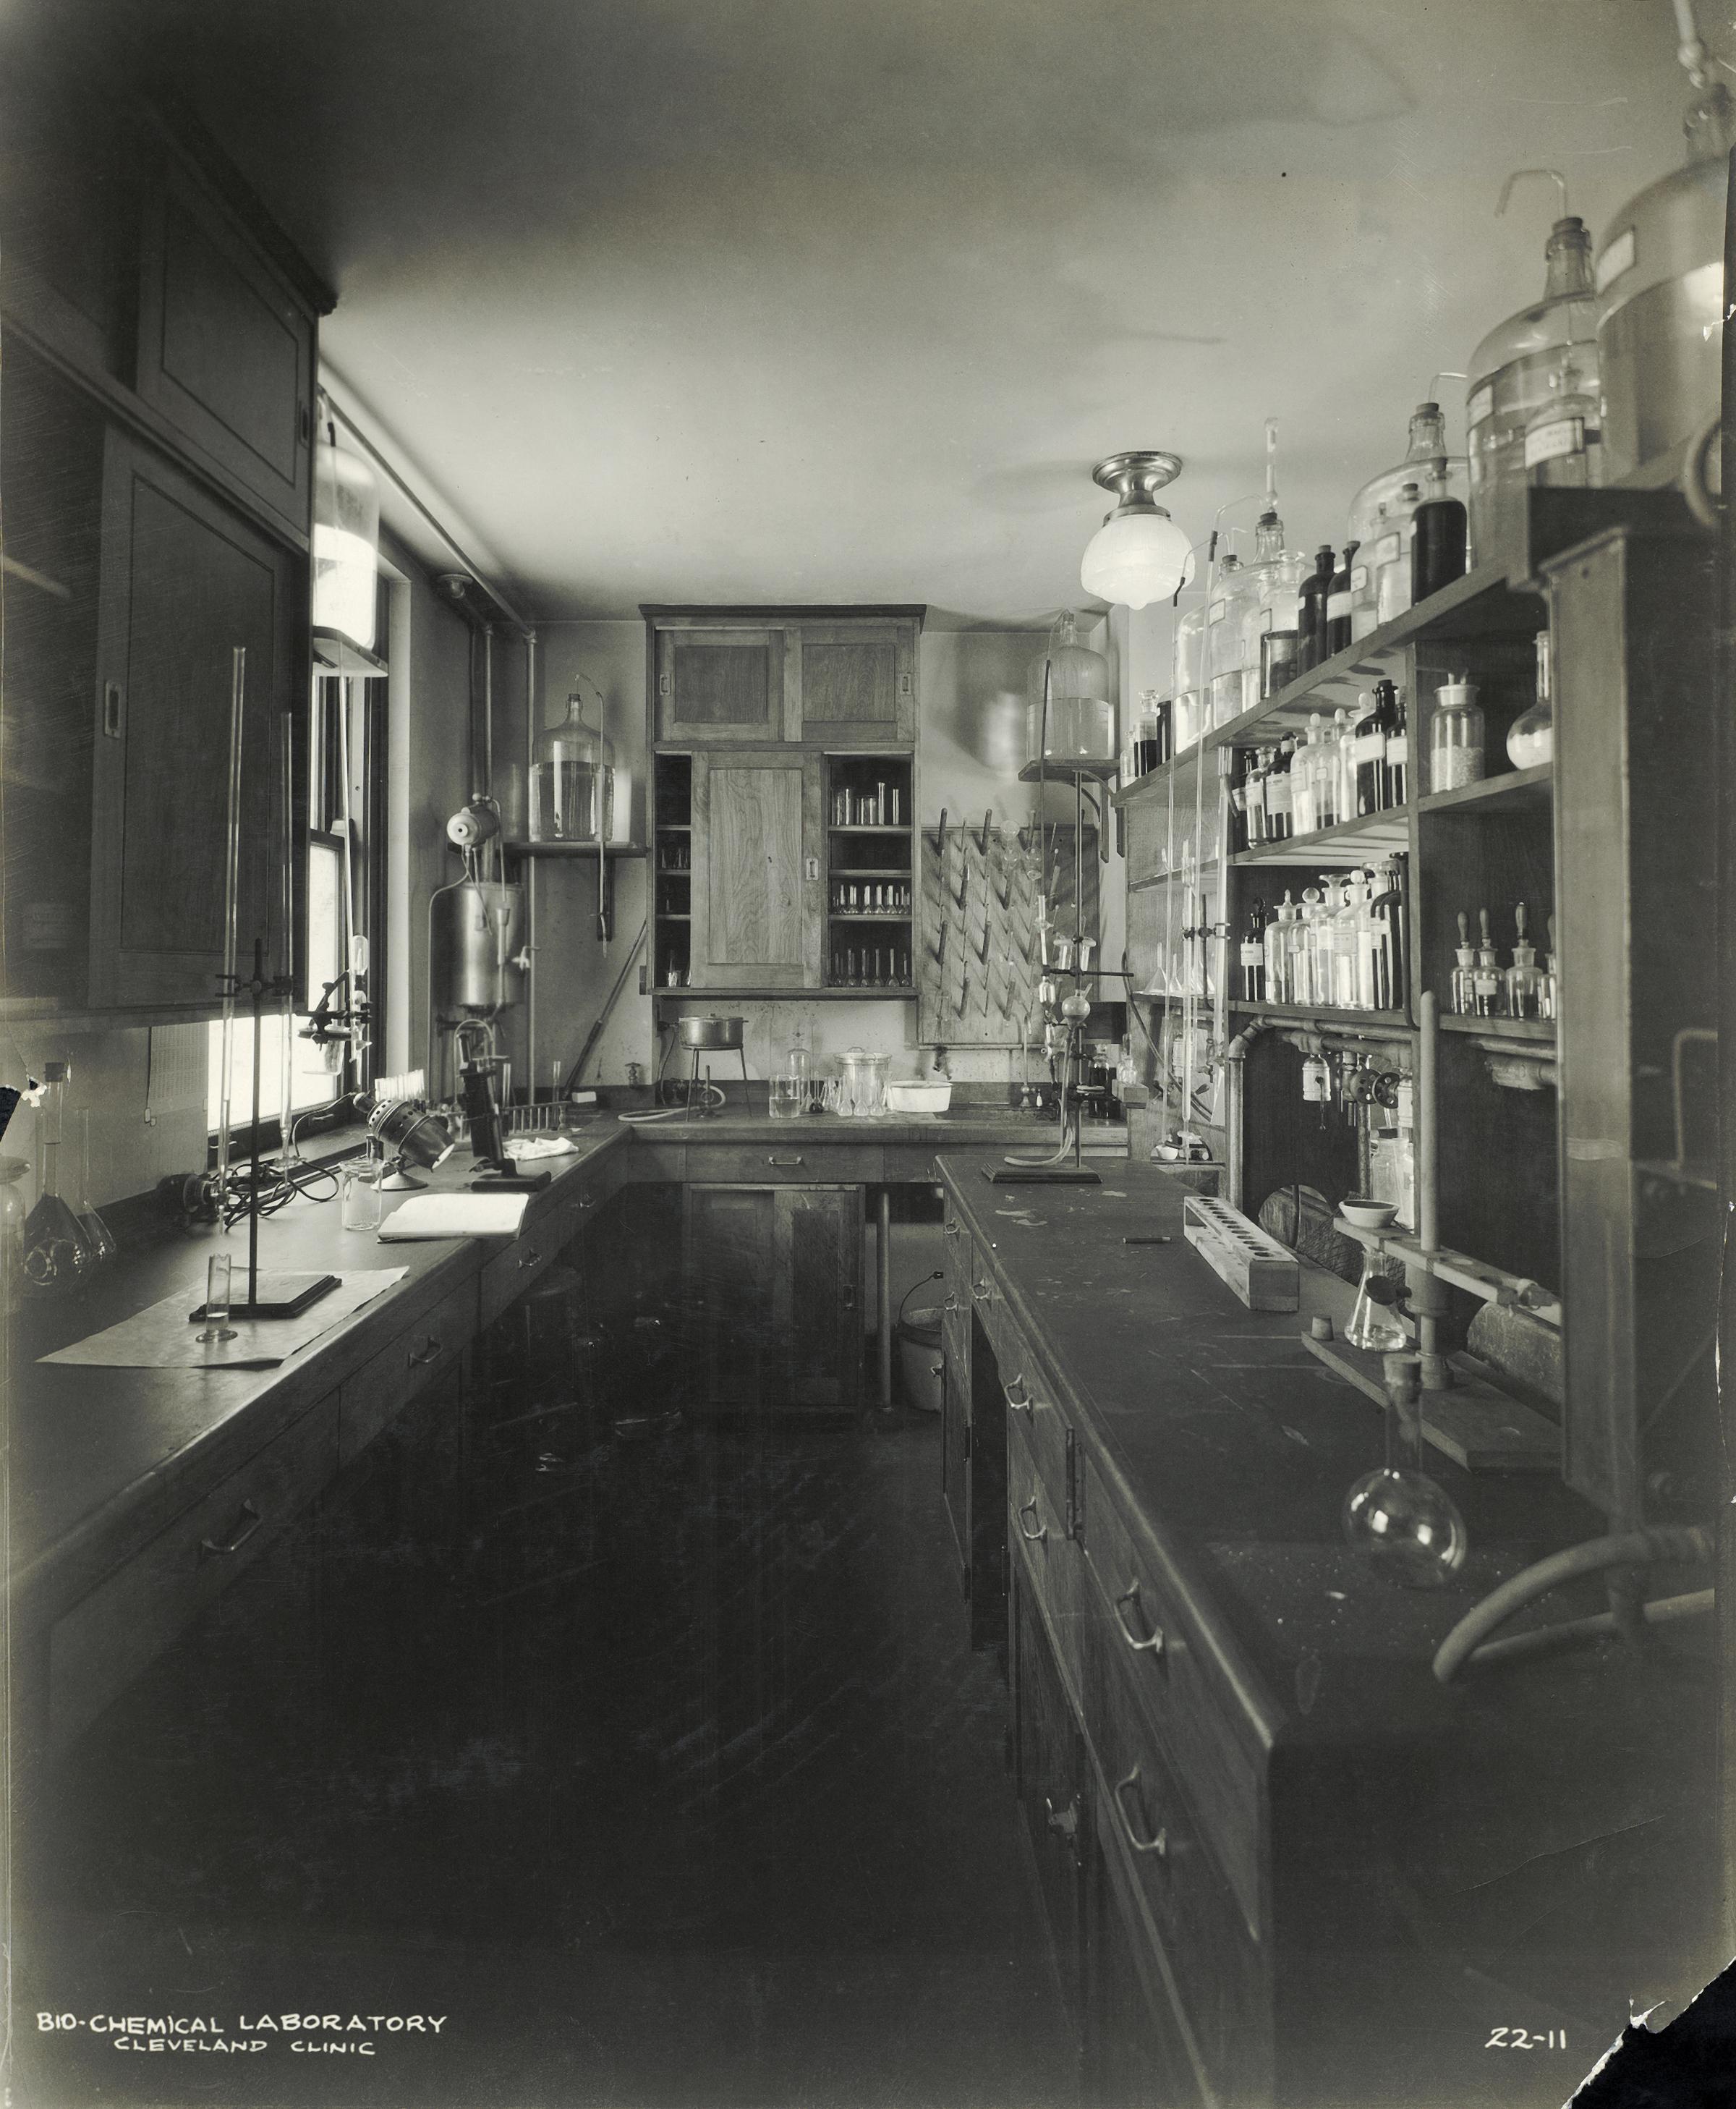 File:Biochemical Lab 1921 A0422a jpg - Wikimedia Commons